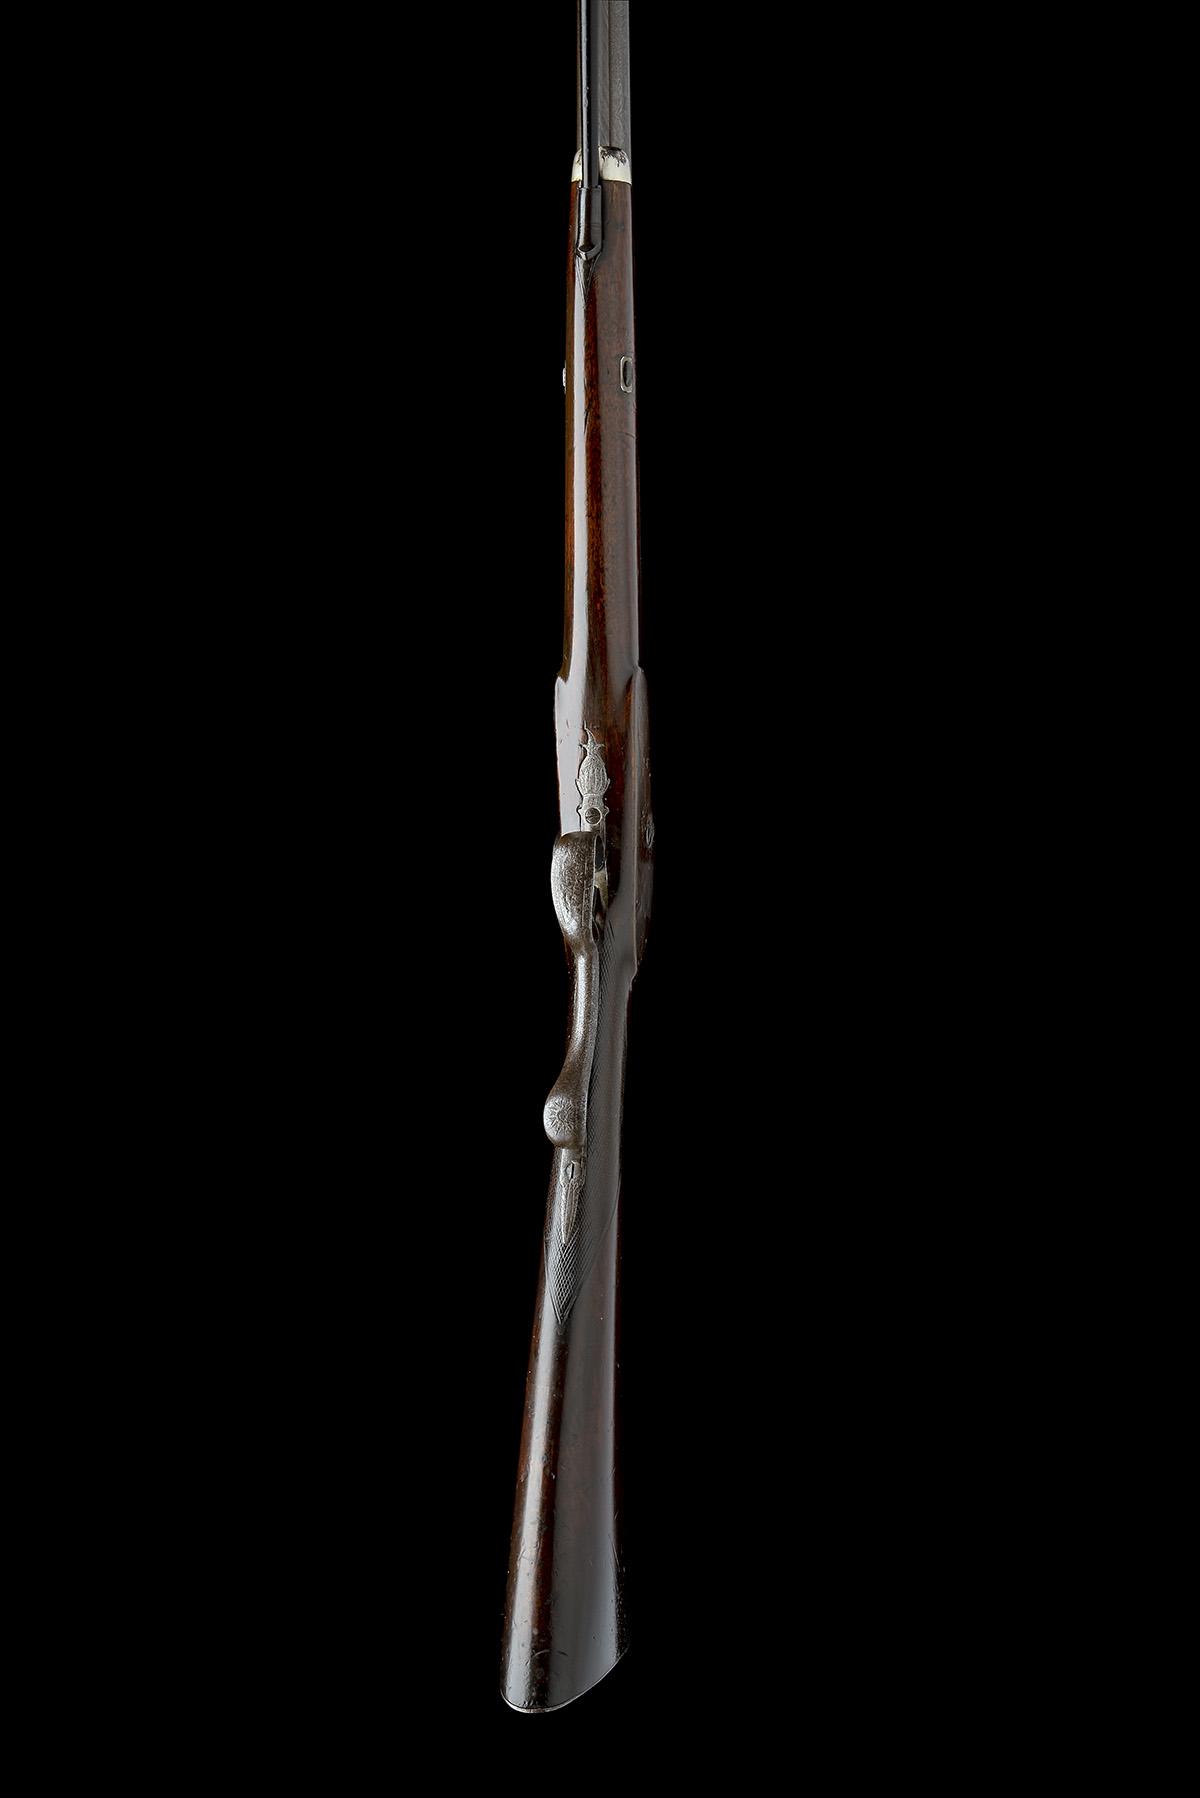 SMITH, LONDON A 12-BORE PERCUSSION SINGLE-BARRELLED SPORTING-GUN, no visible serial number, circa - Image 3 of 8